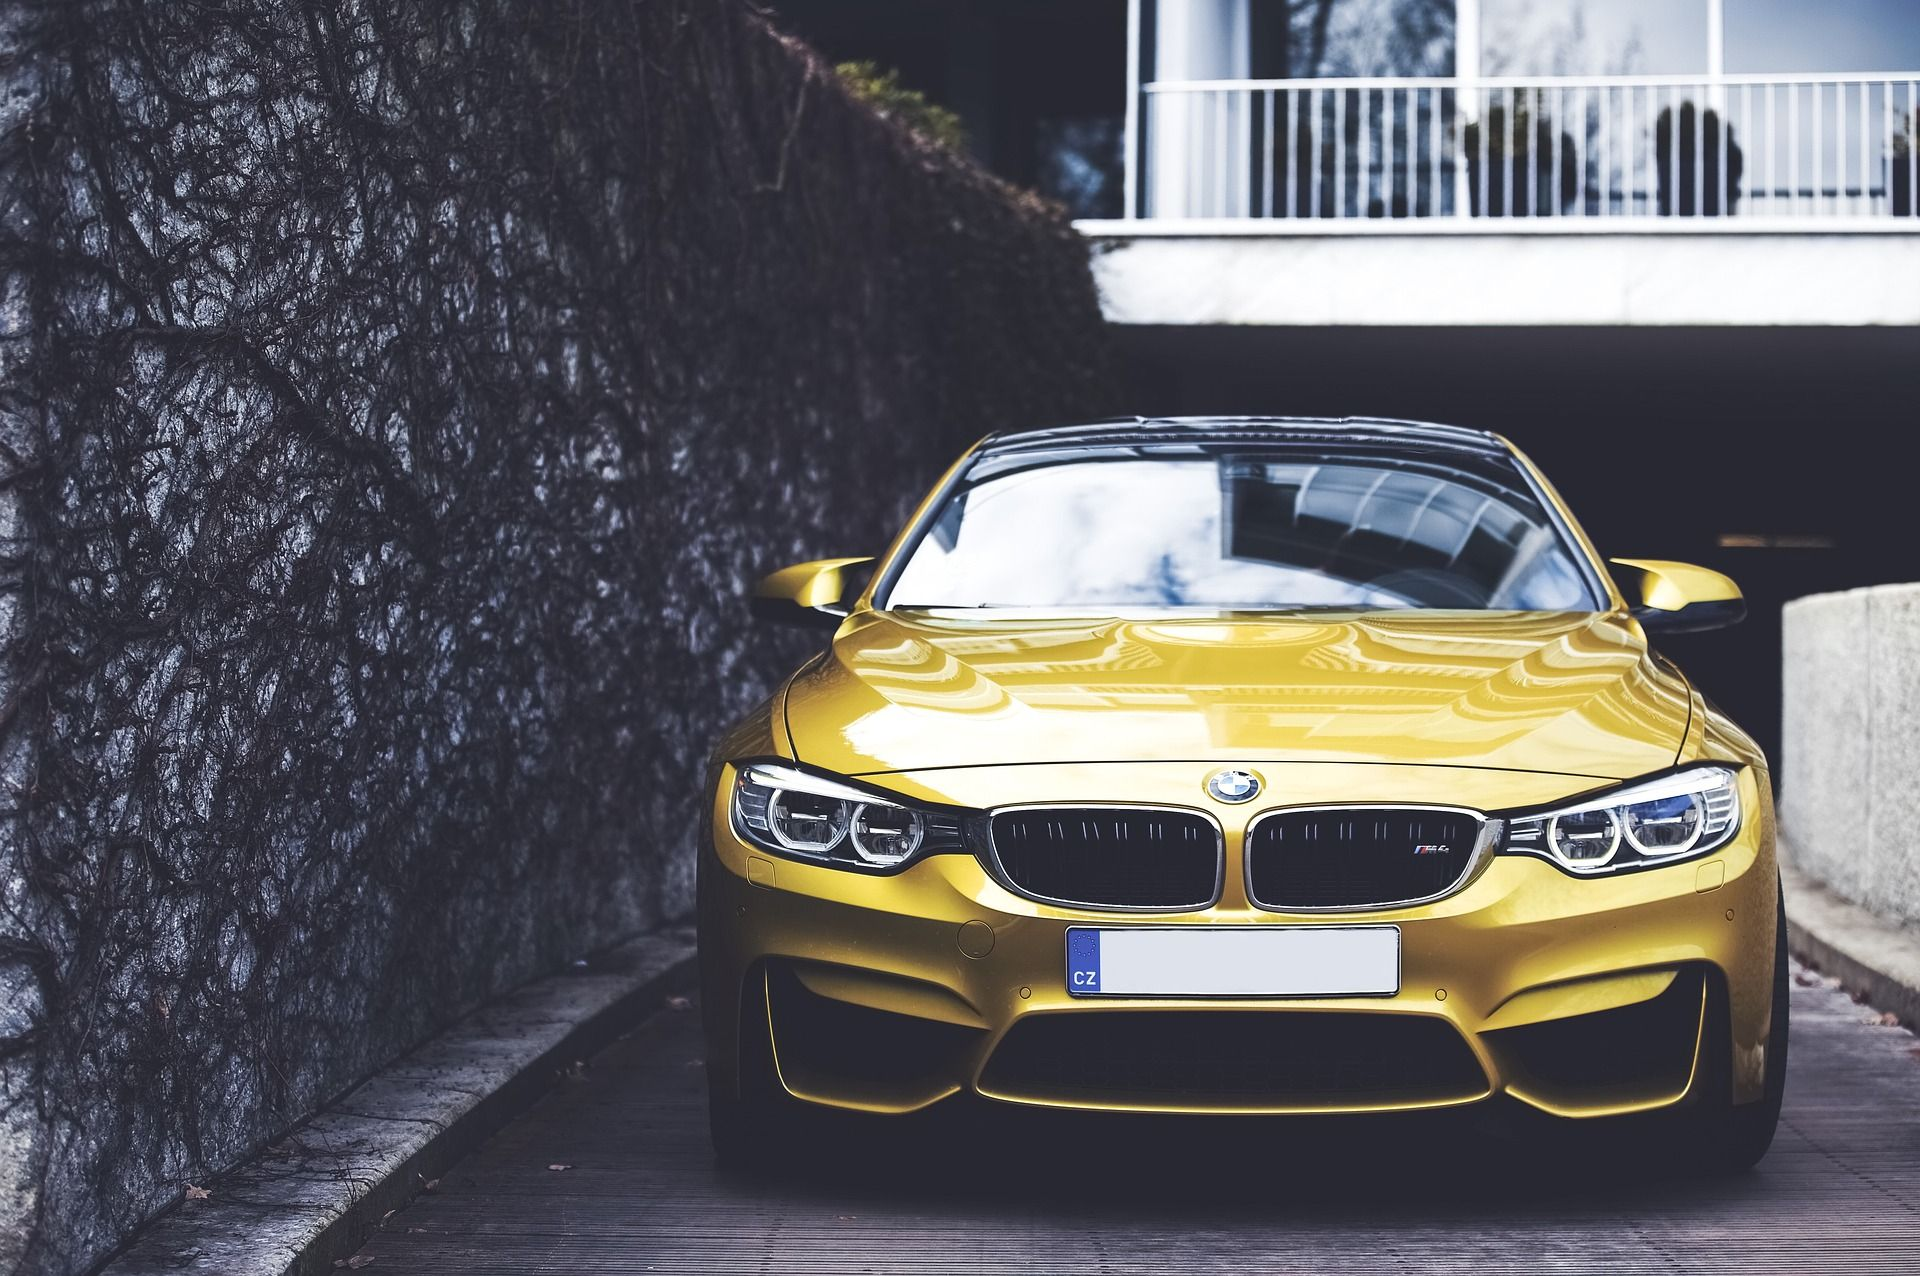 Bmw X2 Suv Galvanizedgold M4 Fuel Economy Luxury Cars